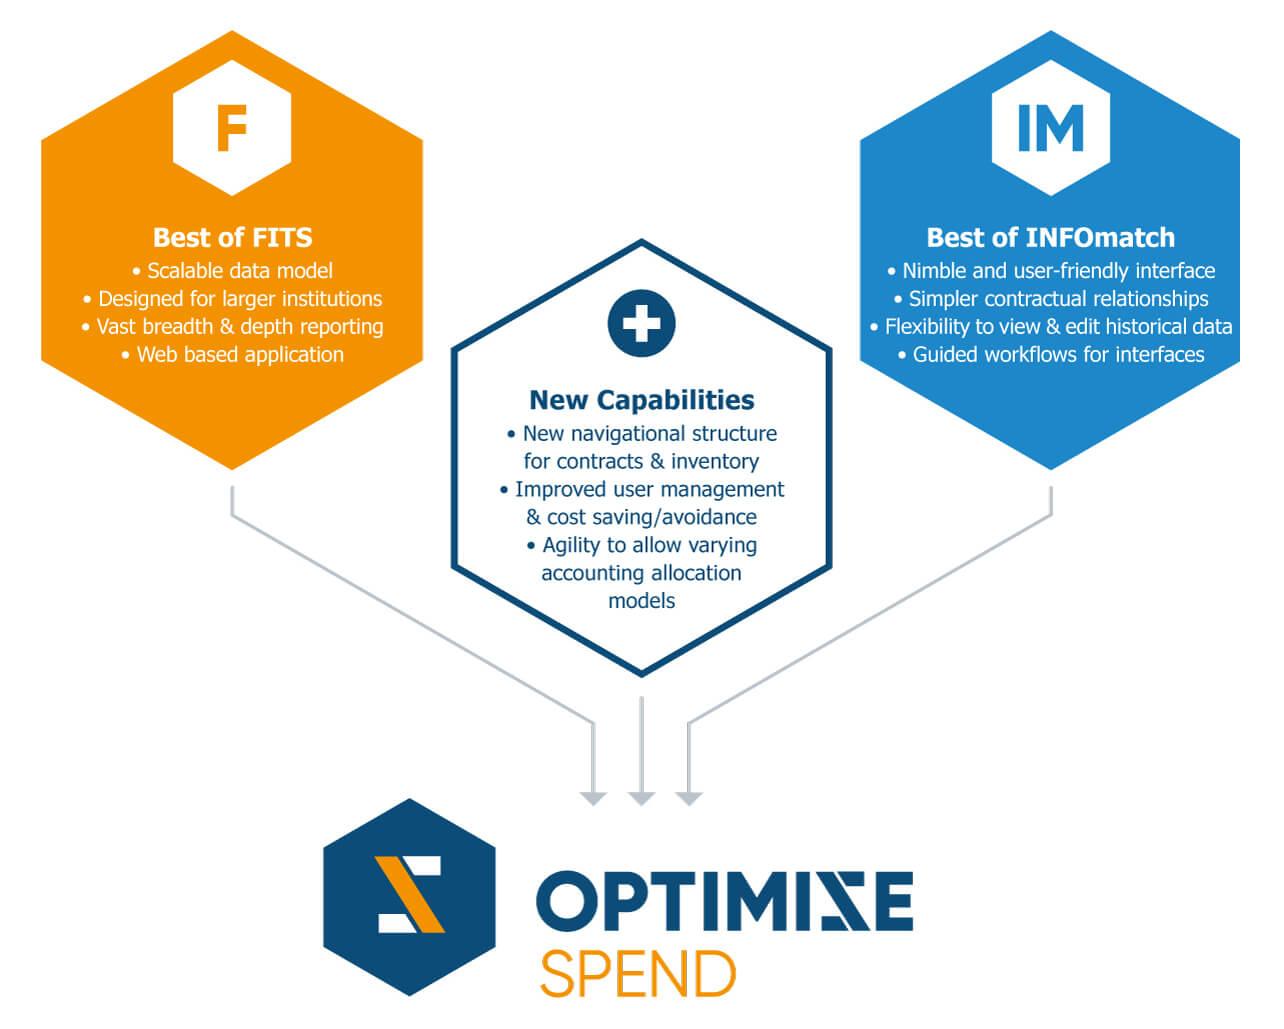 FITS-INFOmatch-Optimize-Spend